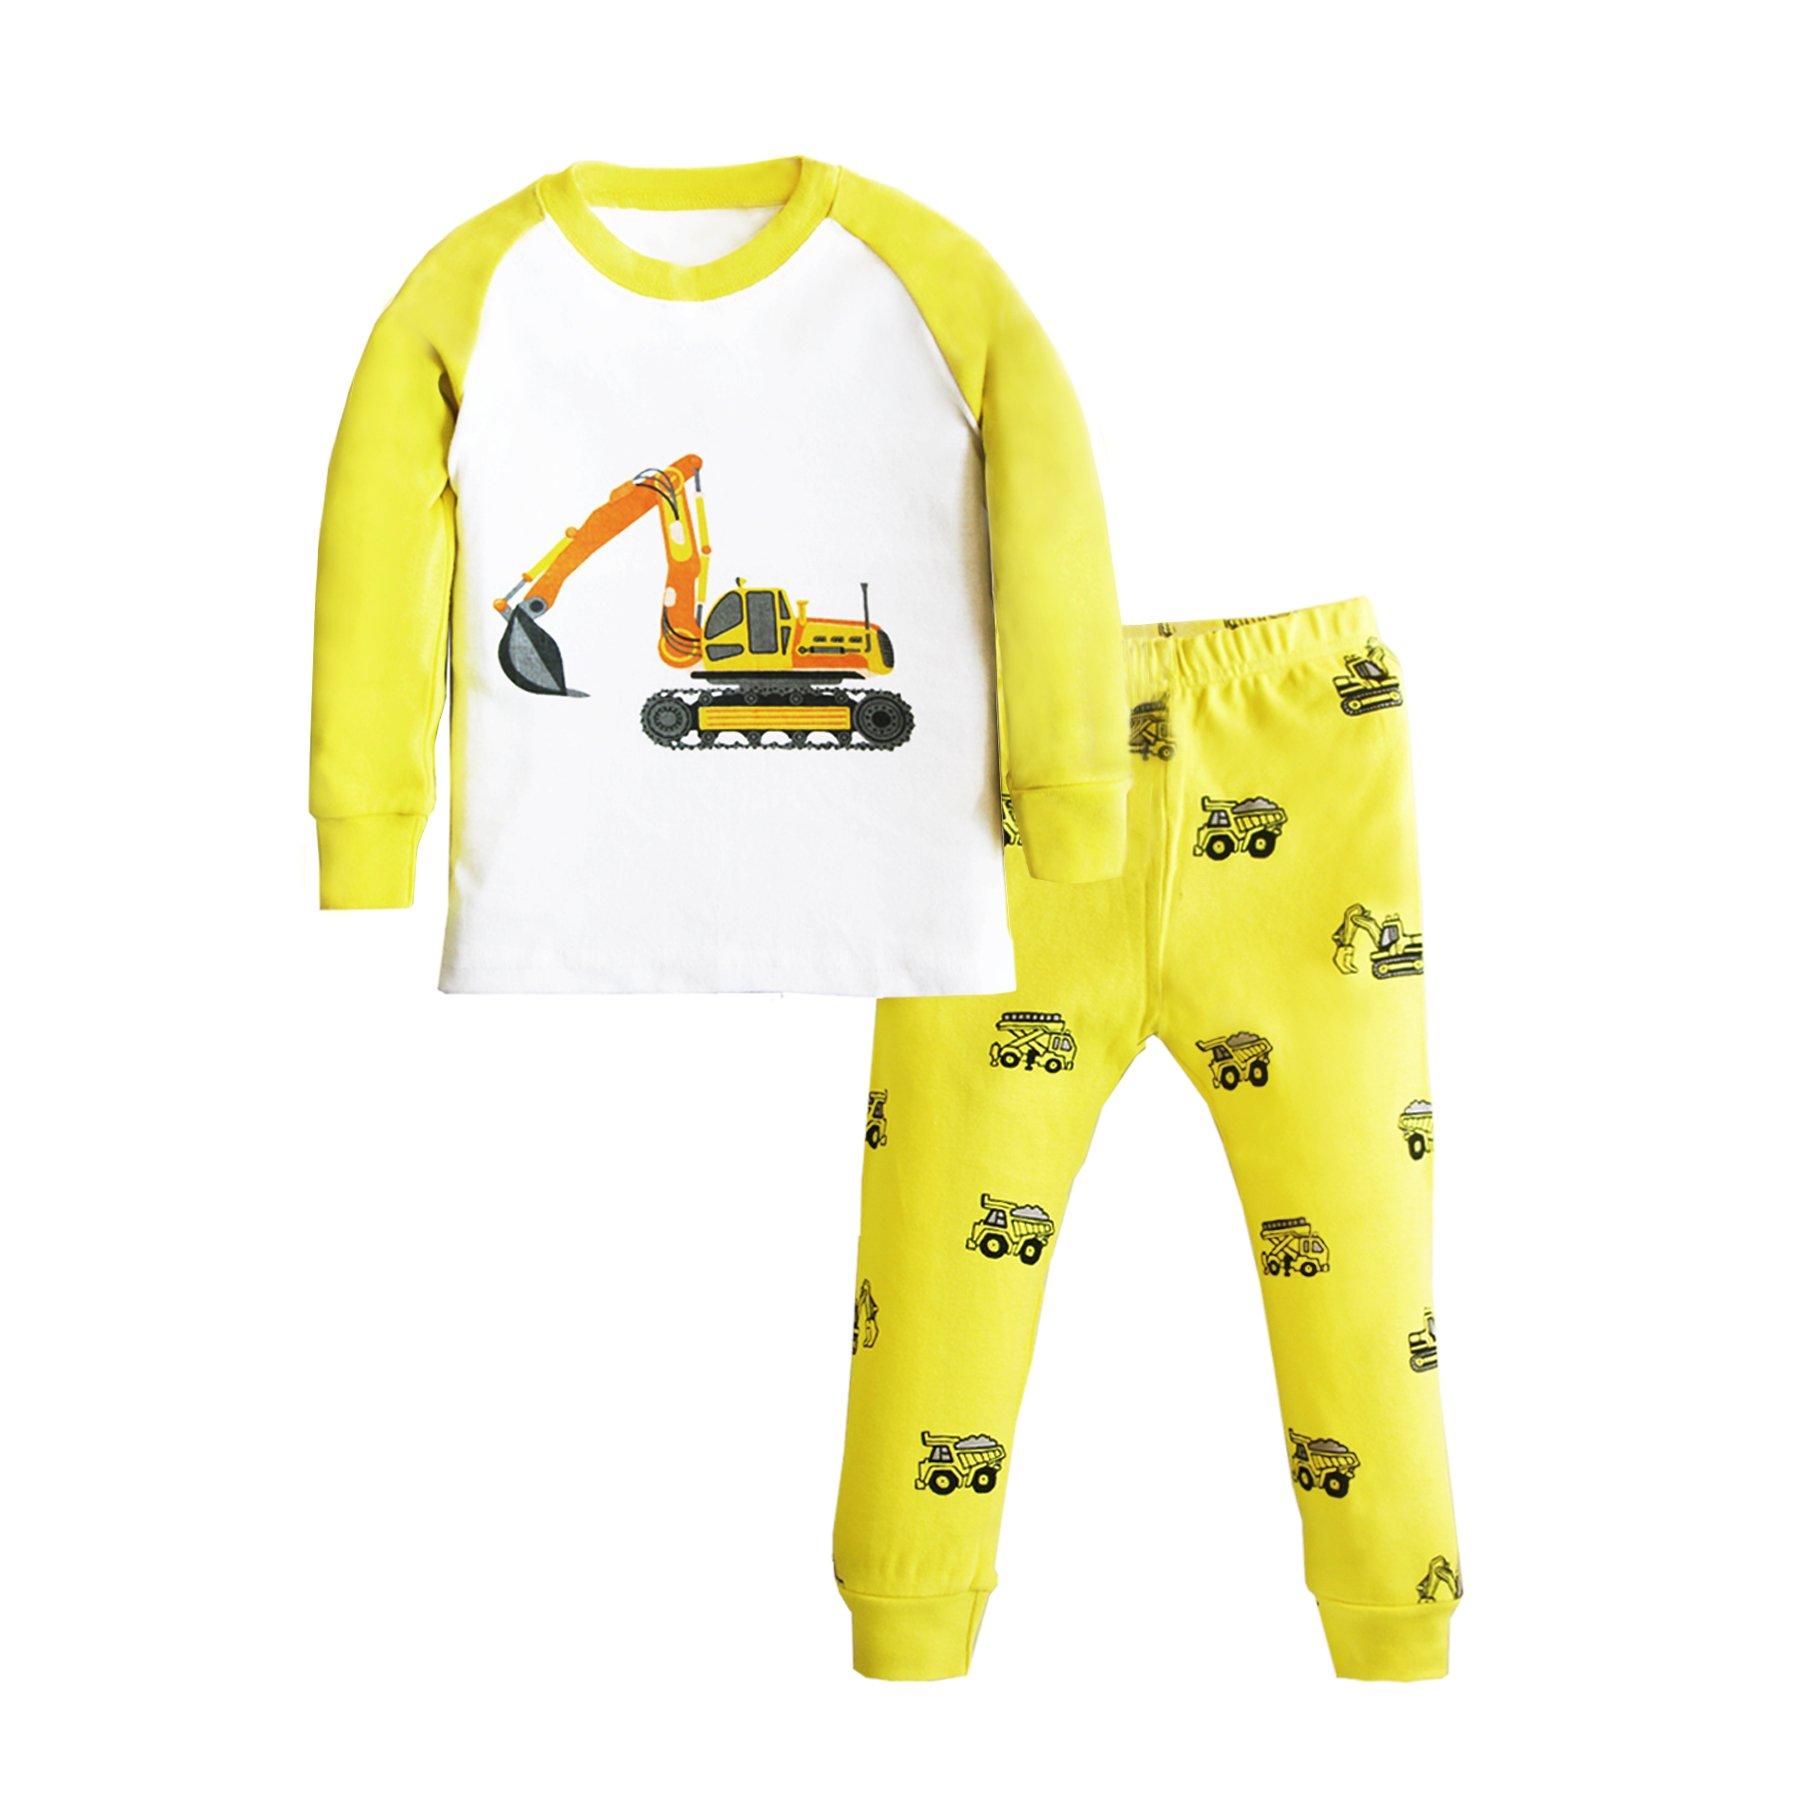 Deer Mum Boys Cool Car Truck Train Sleepwears Kids Pattern Cute Pajamas Set 2 Pieces (Digger, 3t)